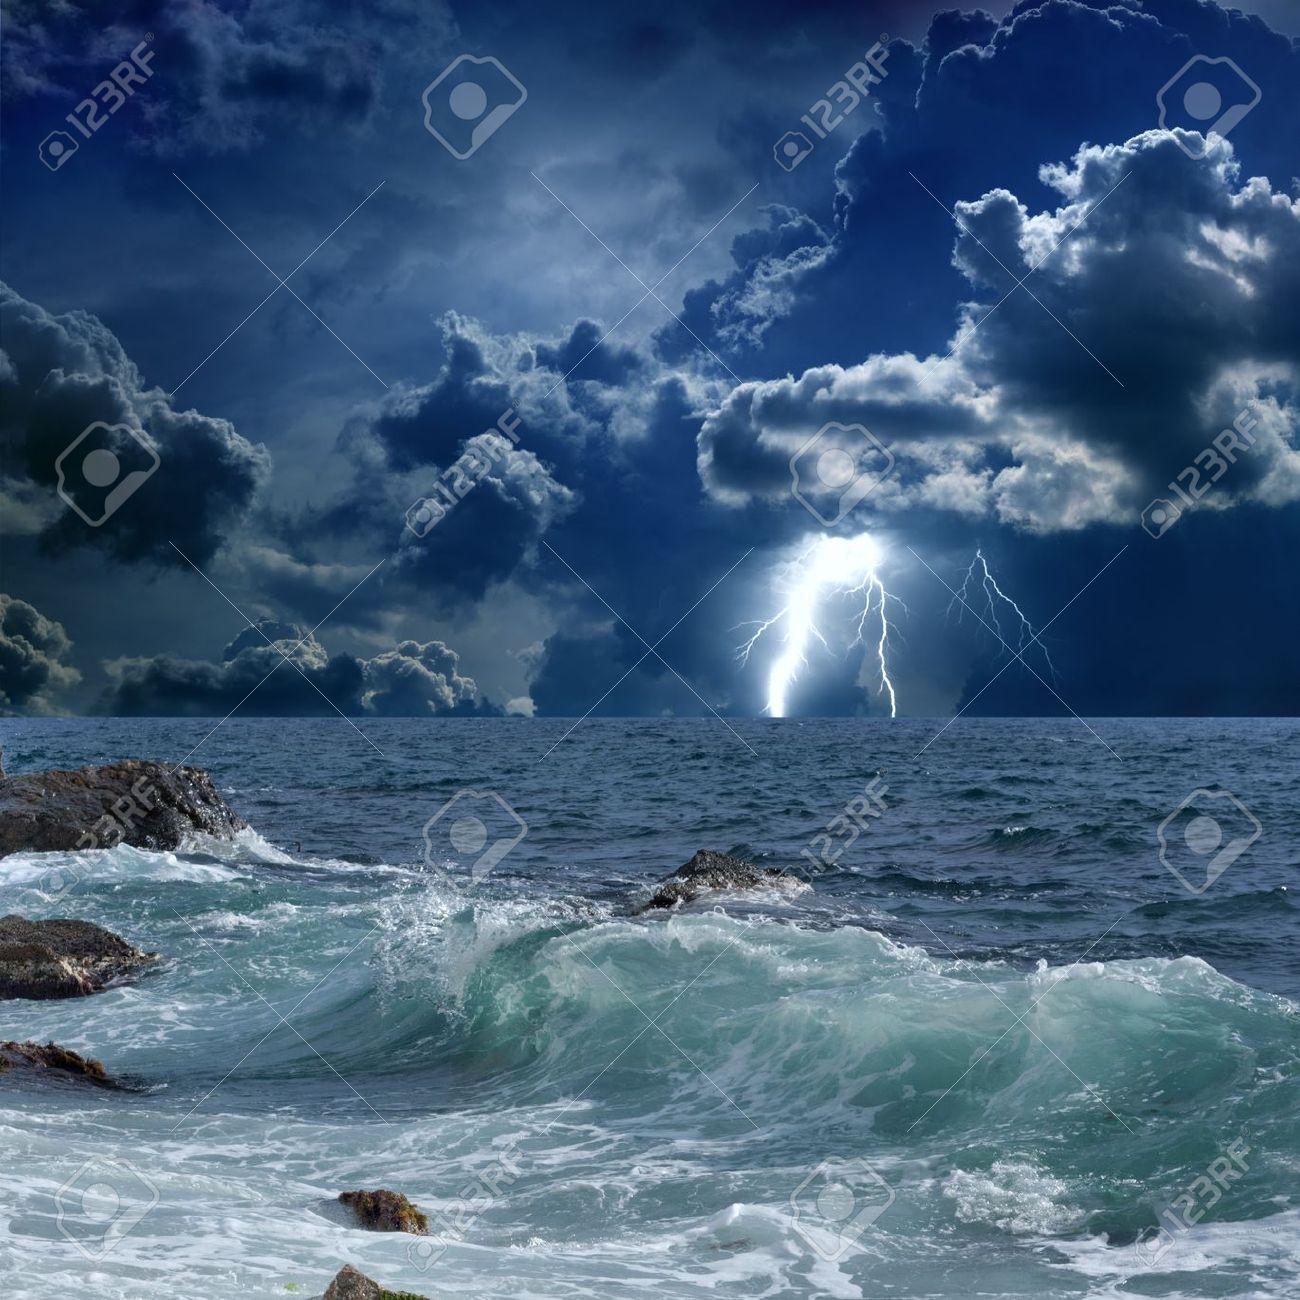 Dramatic nature background - lightnings in dark sky, stormy sea Stock Photo - 18983181